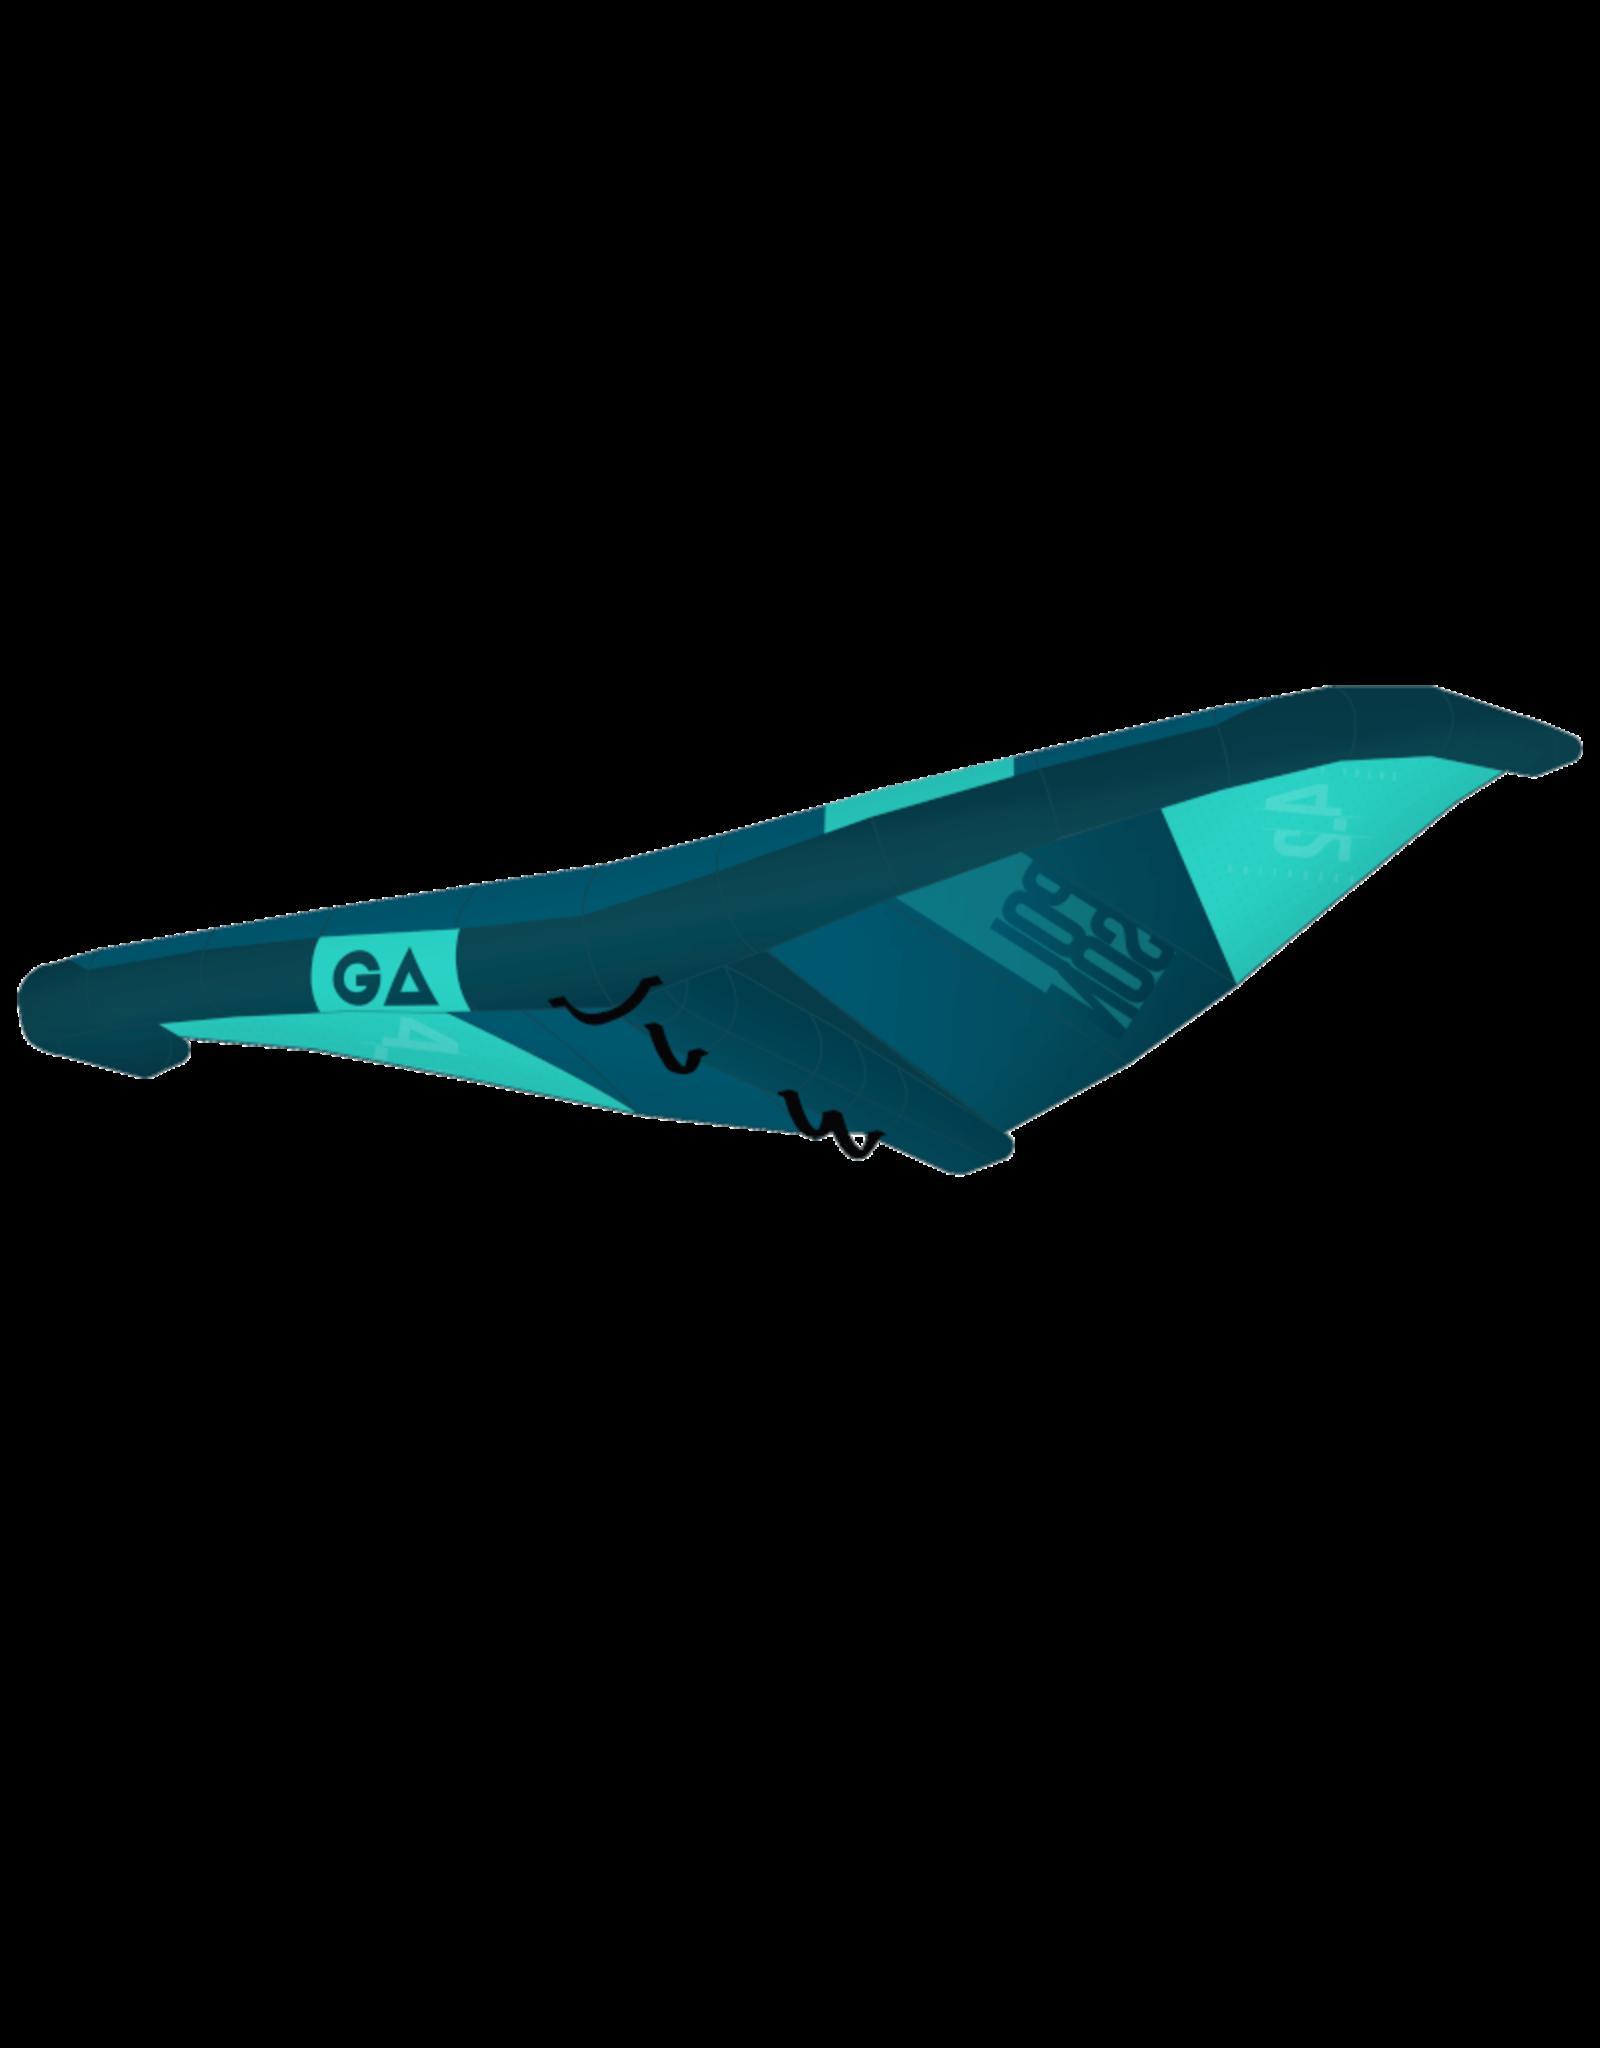 GA Sails GA Sails Poison Wingfoil